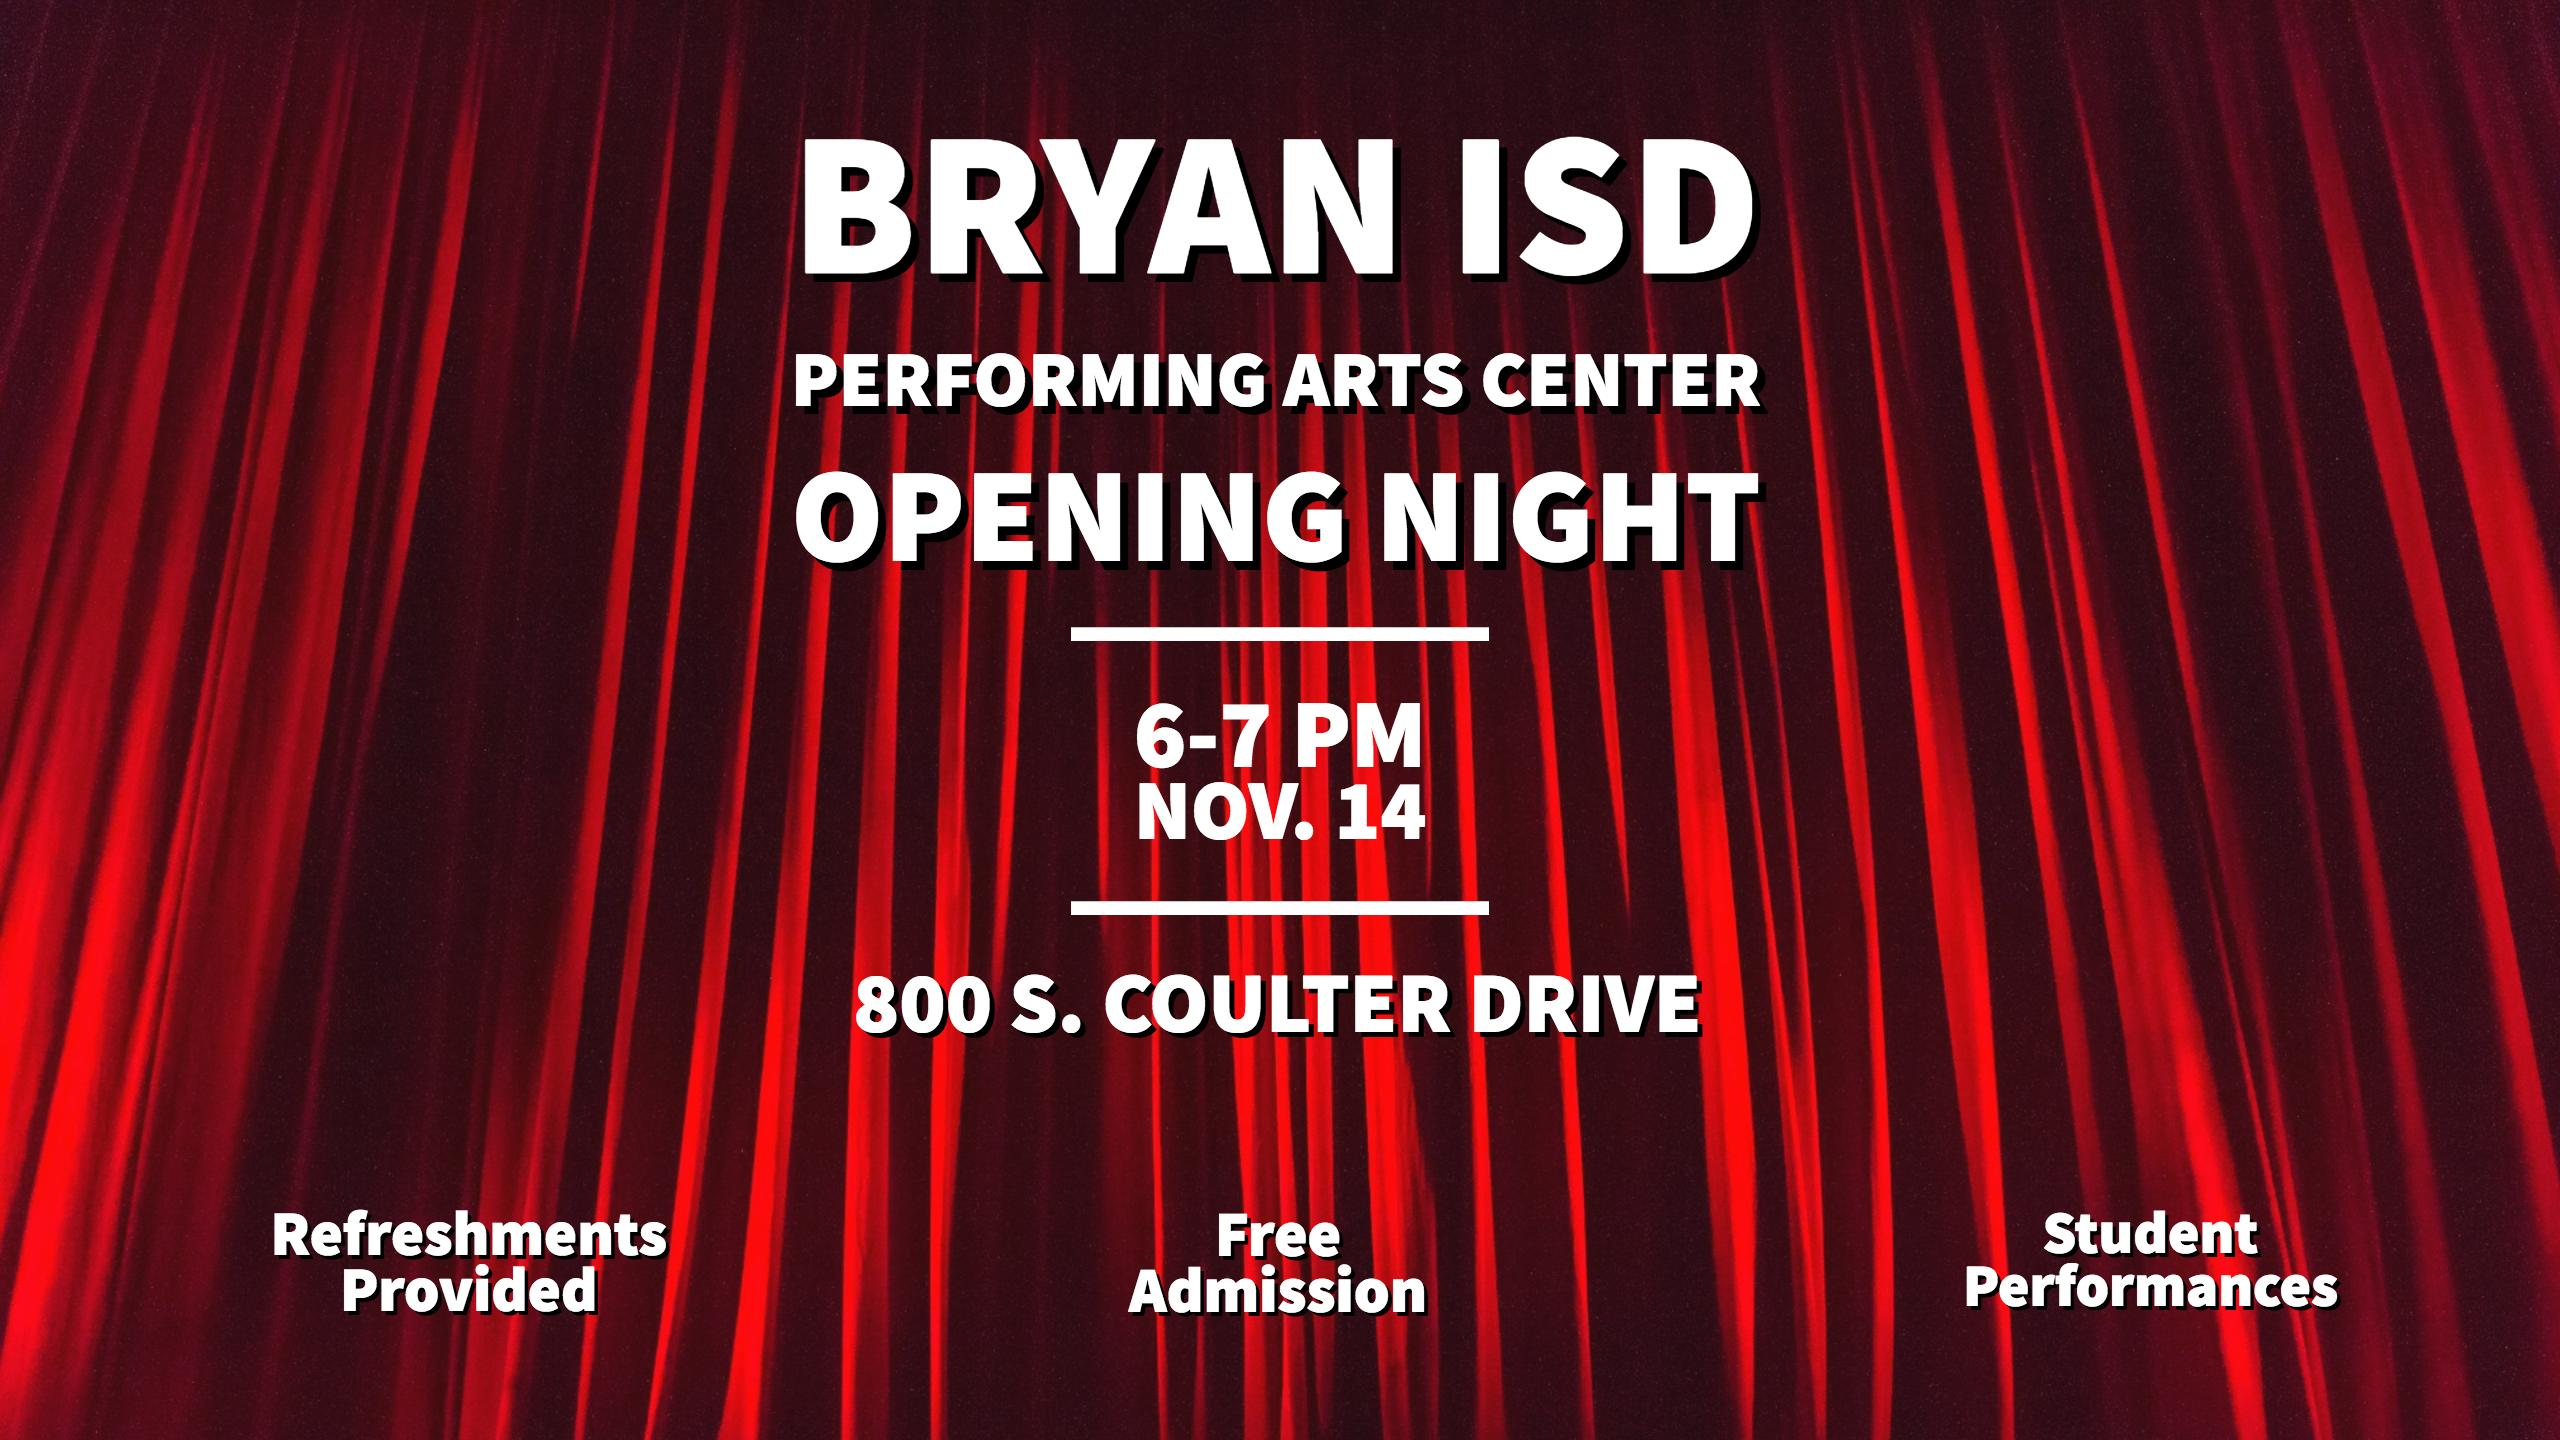 z Bryan ISD Performing Arts Center.PAC Opening.Nov.15 (1)